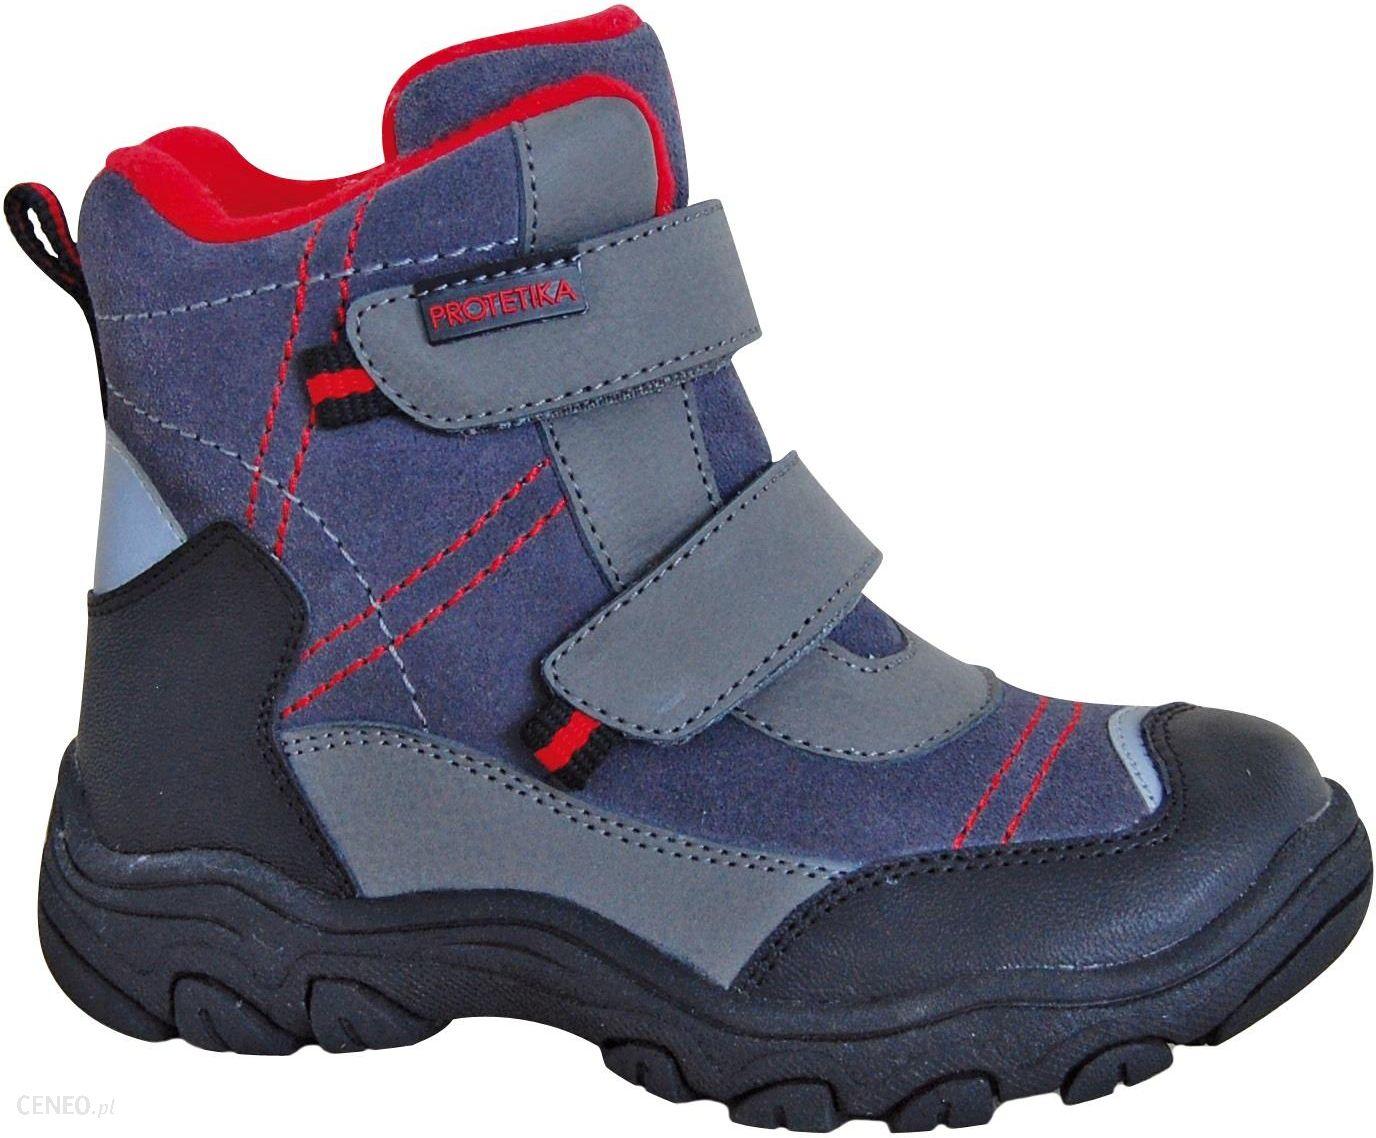 5e605258e034d Protetika buty zimowe za kostkę chłopięce Hant 31